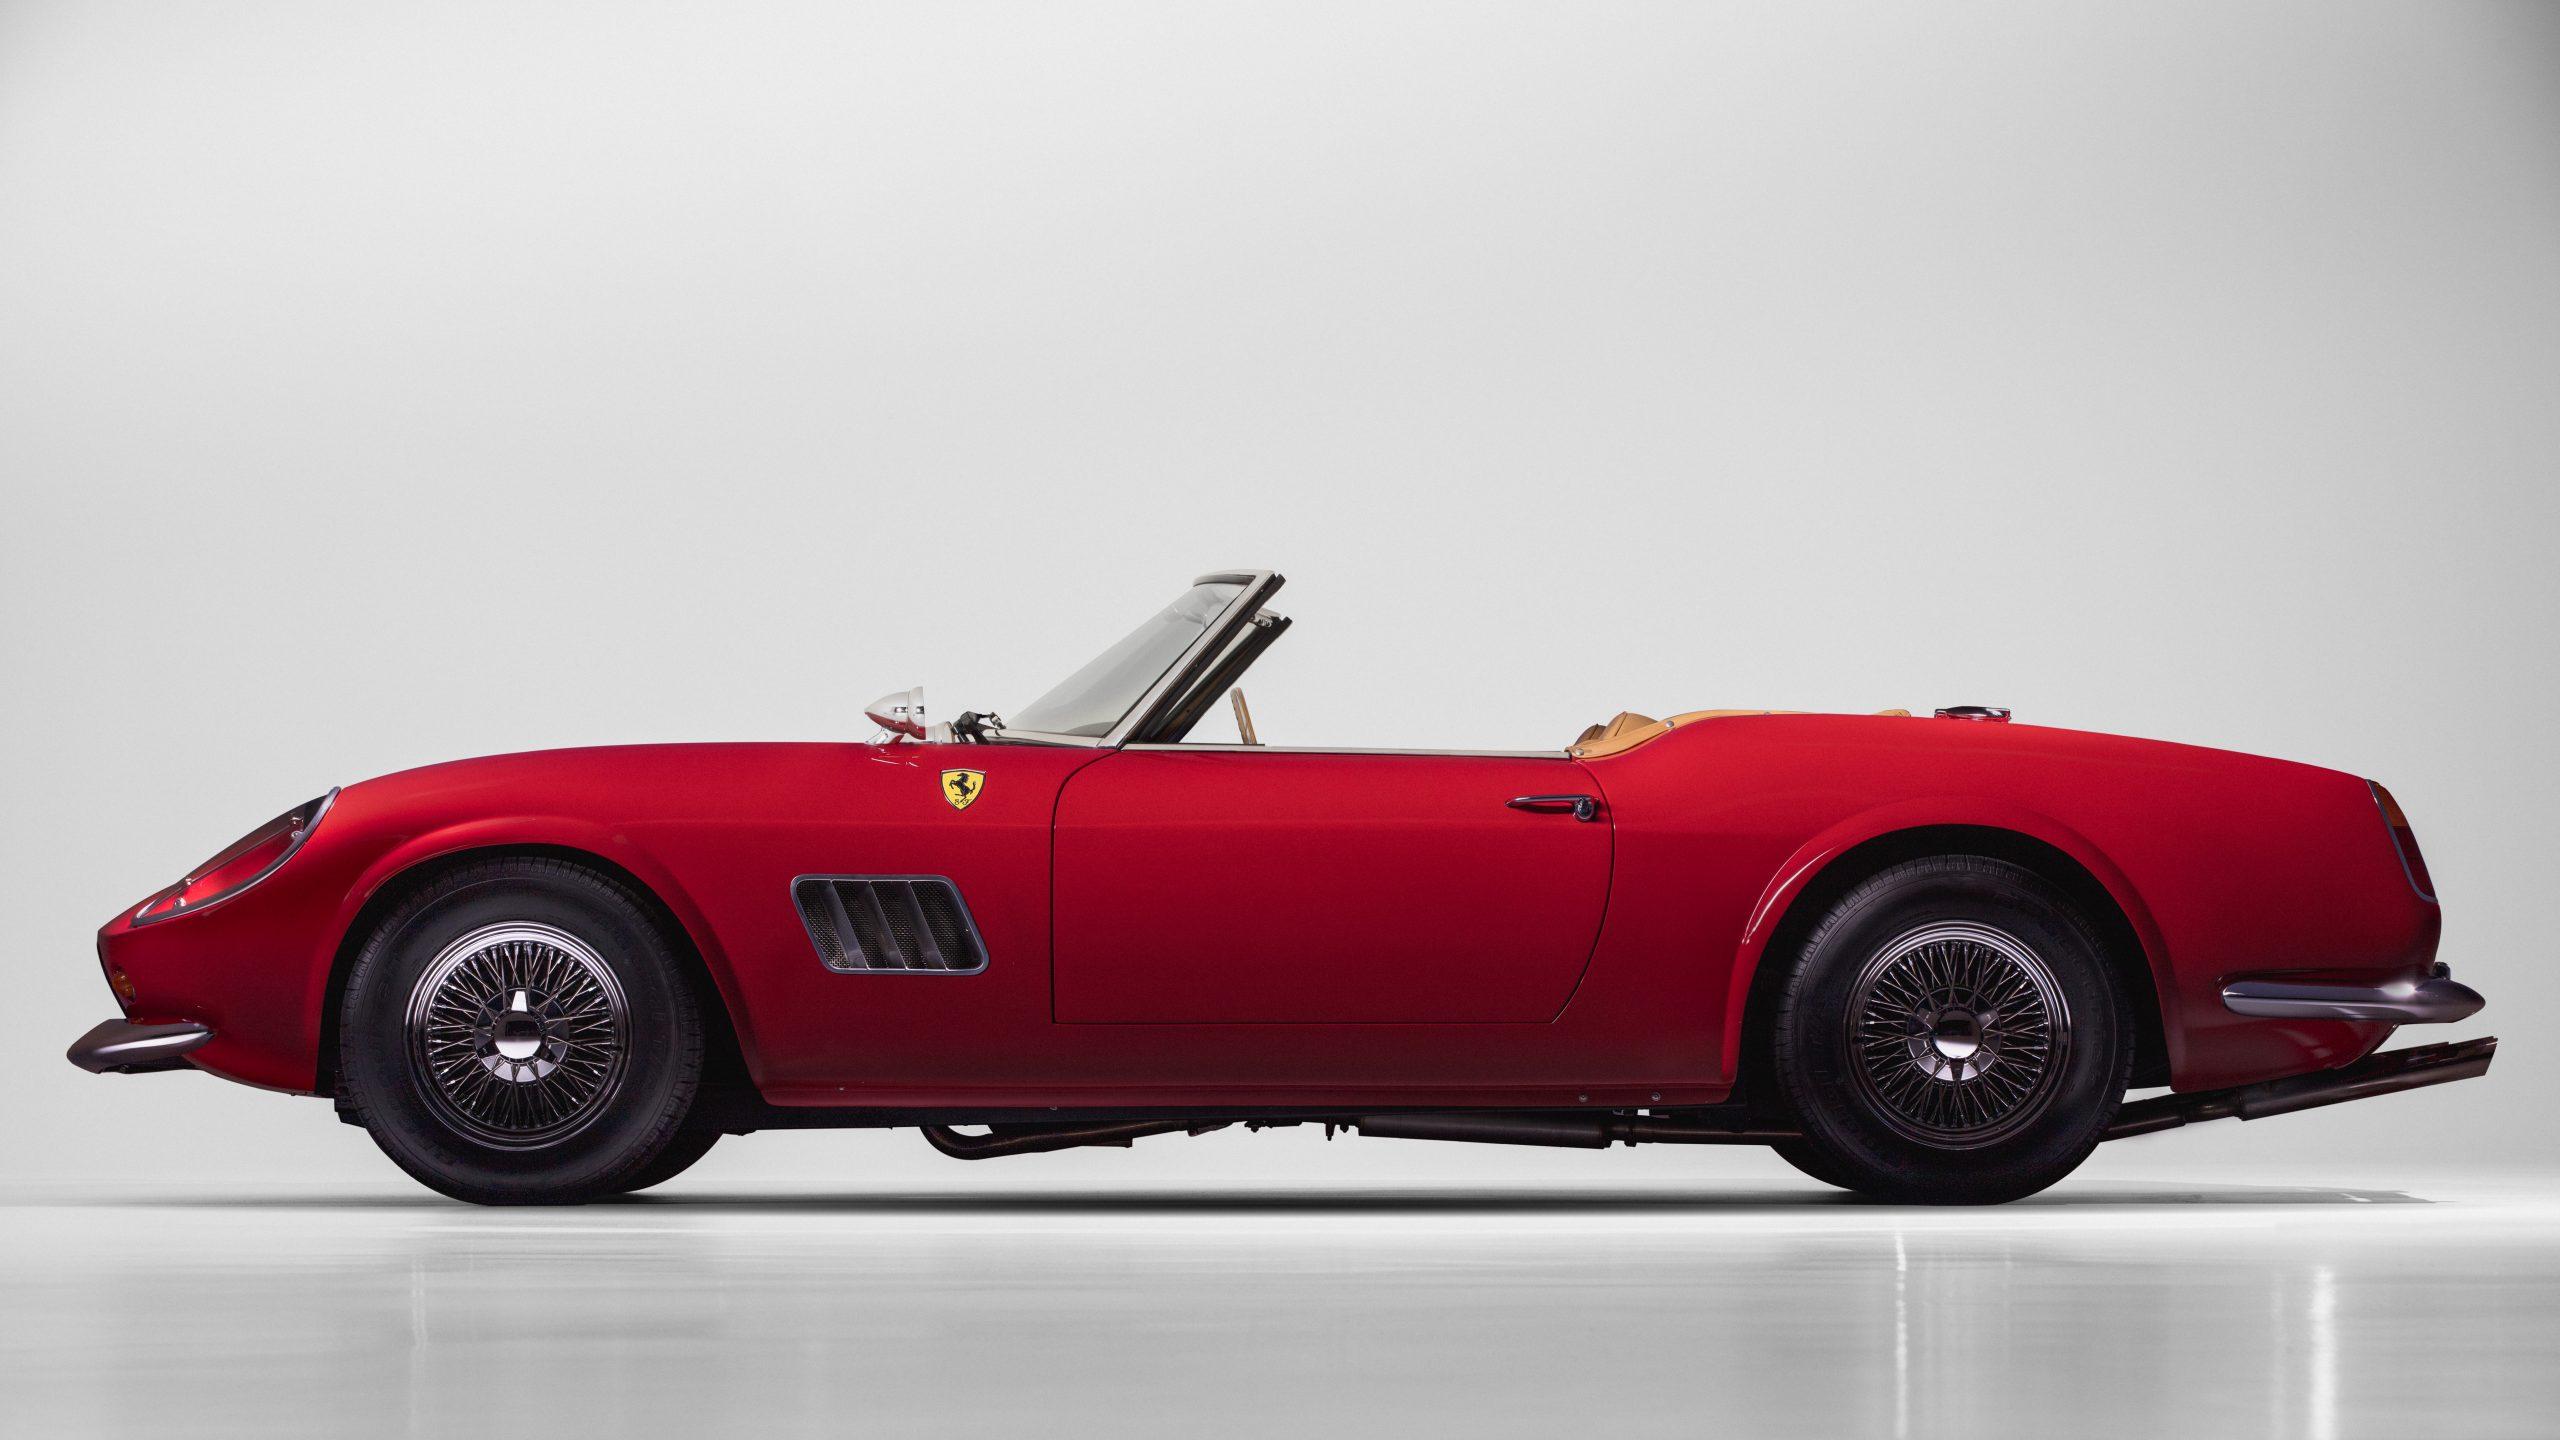 Ferris Bueller Ferrari - HVA Studio drivers side profile